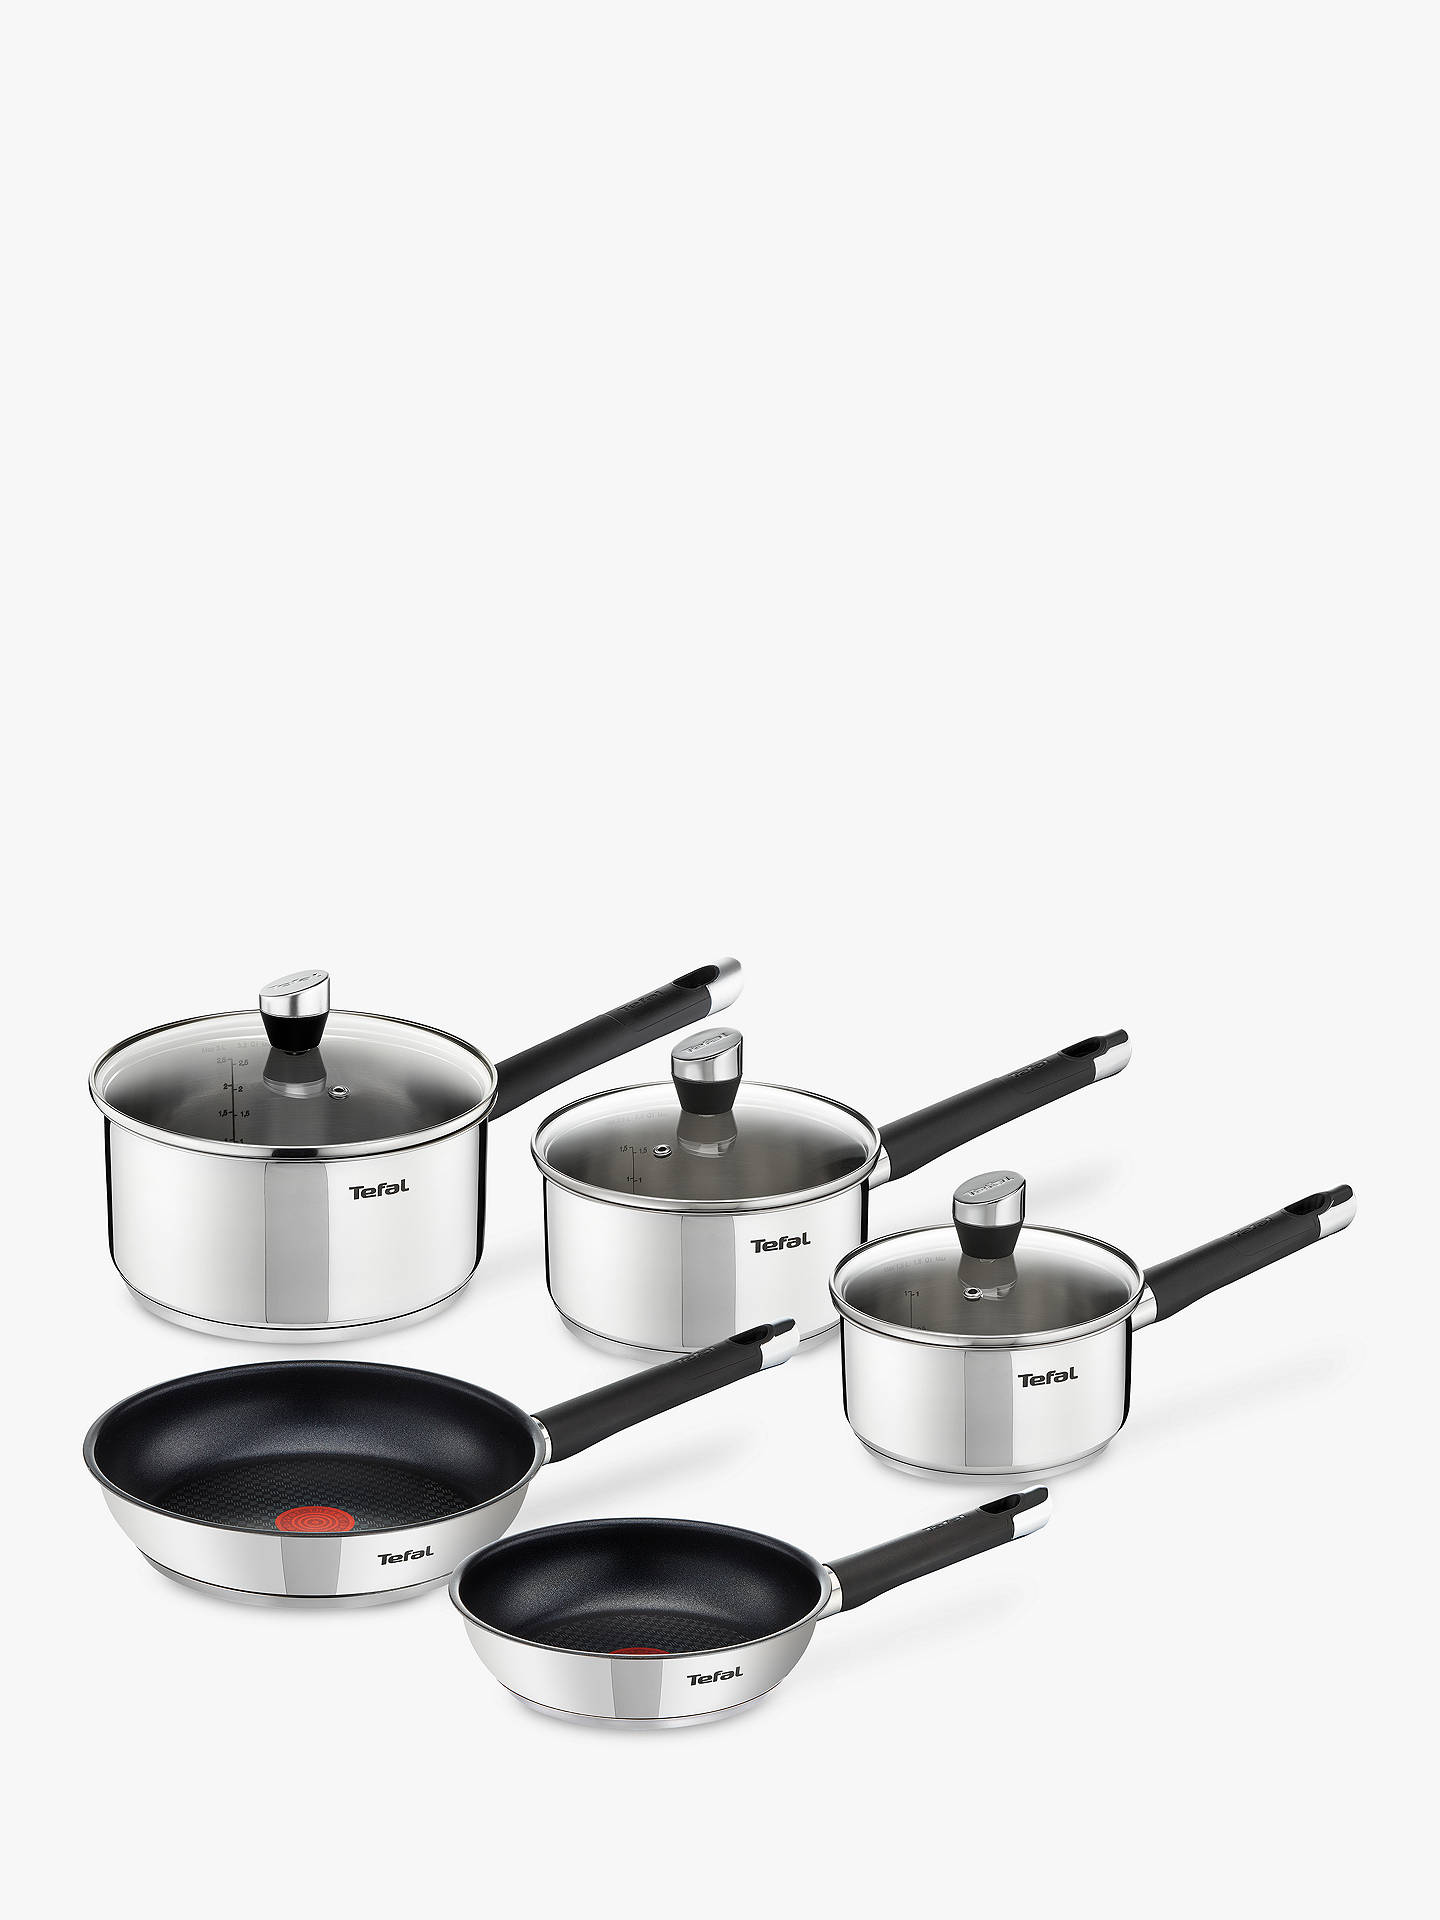 tefal emotion stainless steel pan set pieces 5 at john. Black Bedroom Furniture Sets. Home Design Ideas